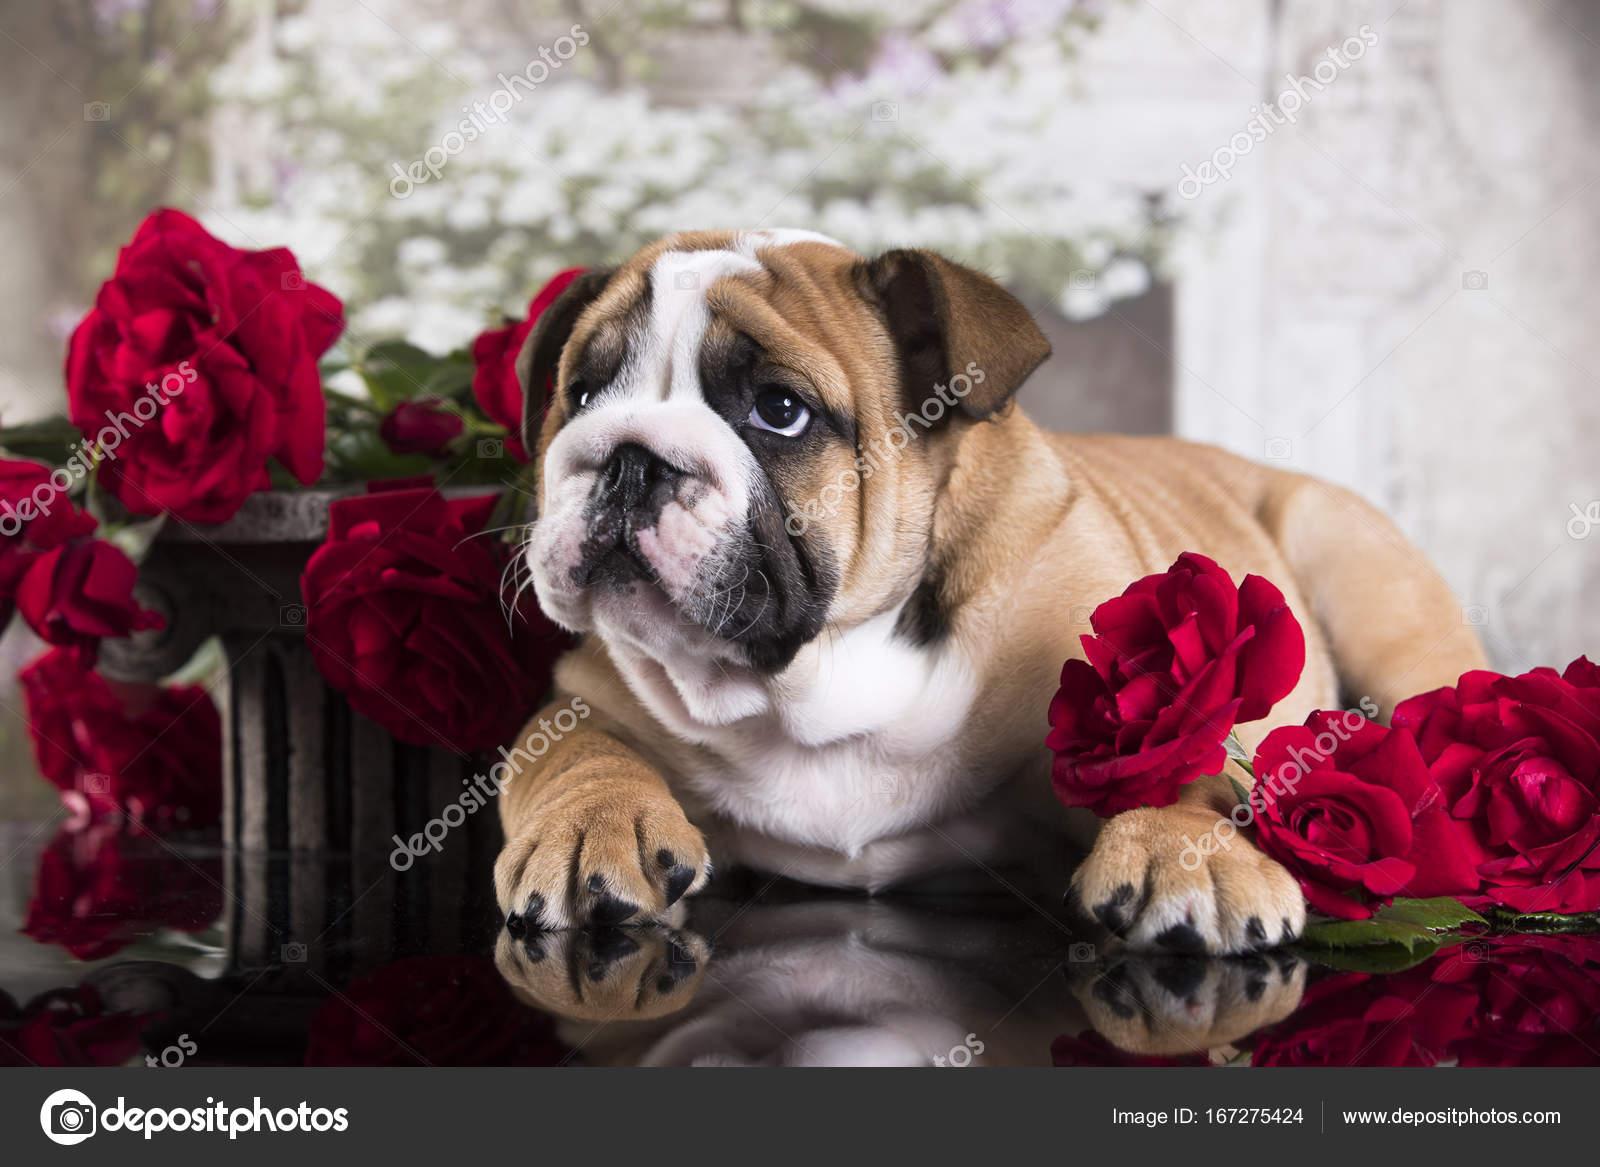 English Bulldog Puppy And Flowers Stock Photo C Lilun Li 167275424